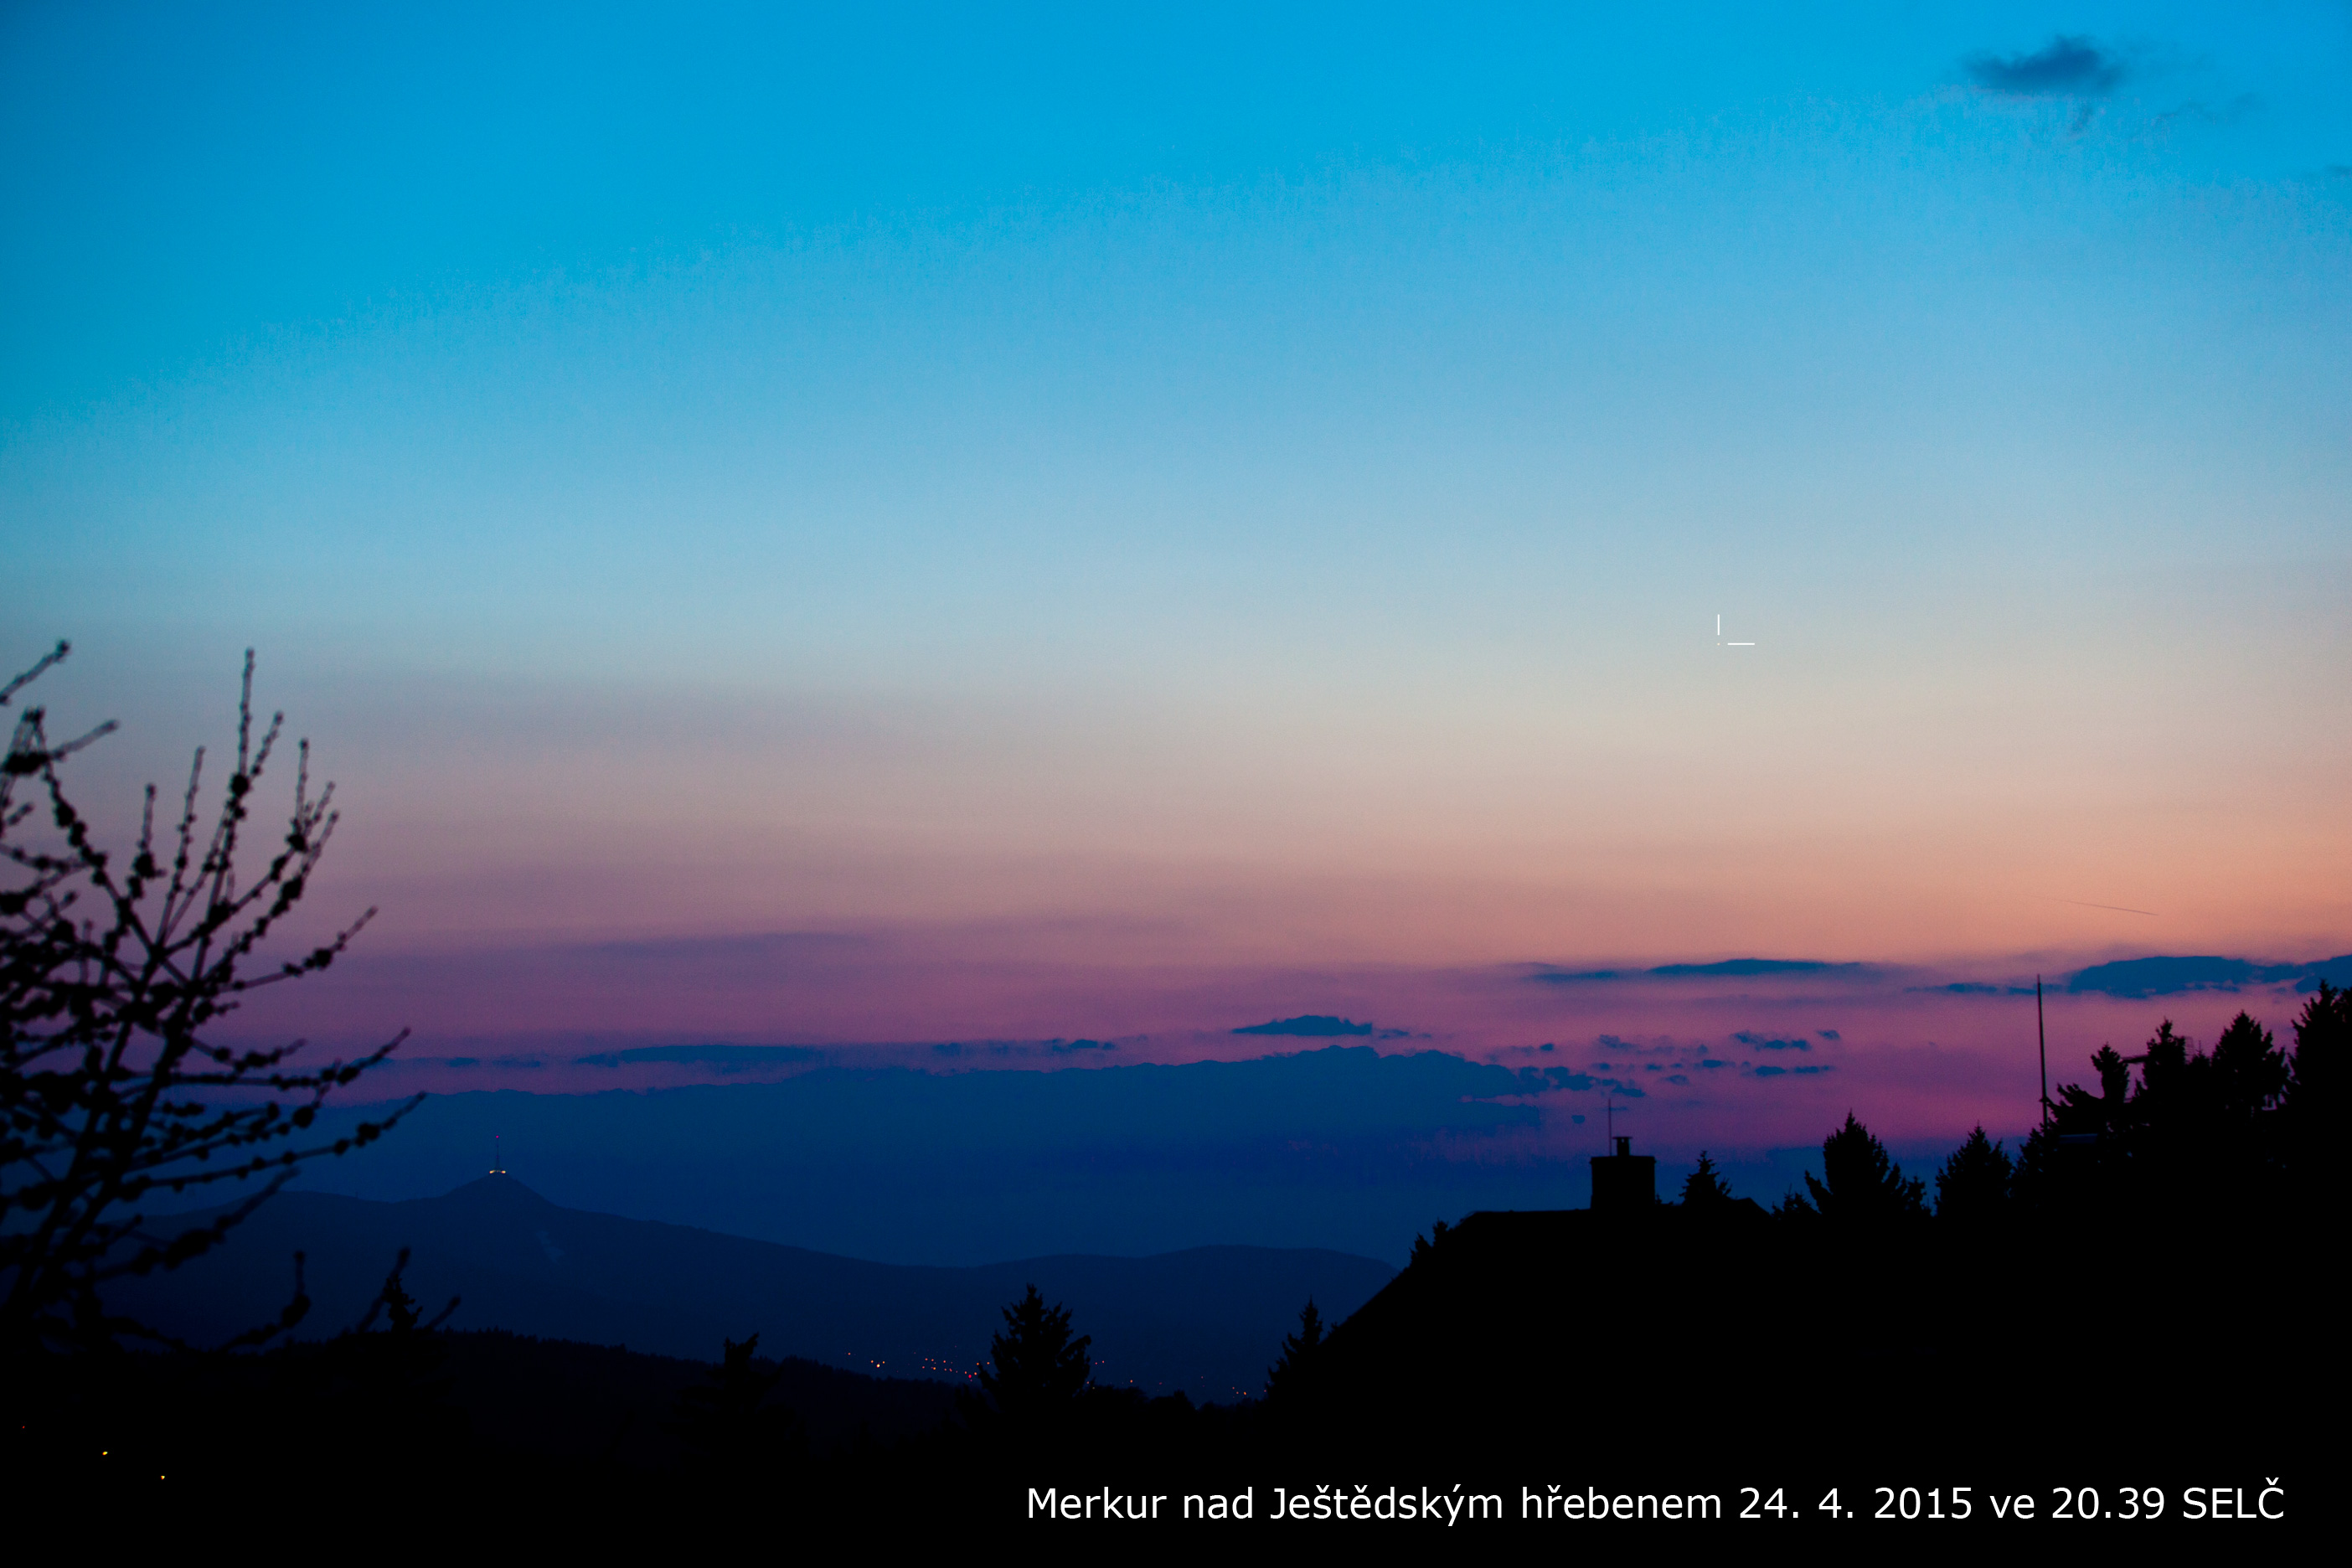 Merkur 24. 4. 2015 Aleš Majer